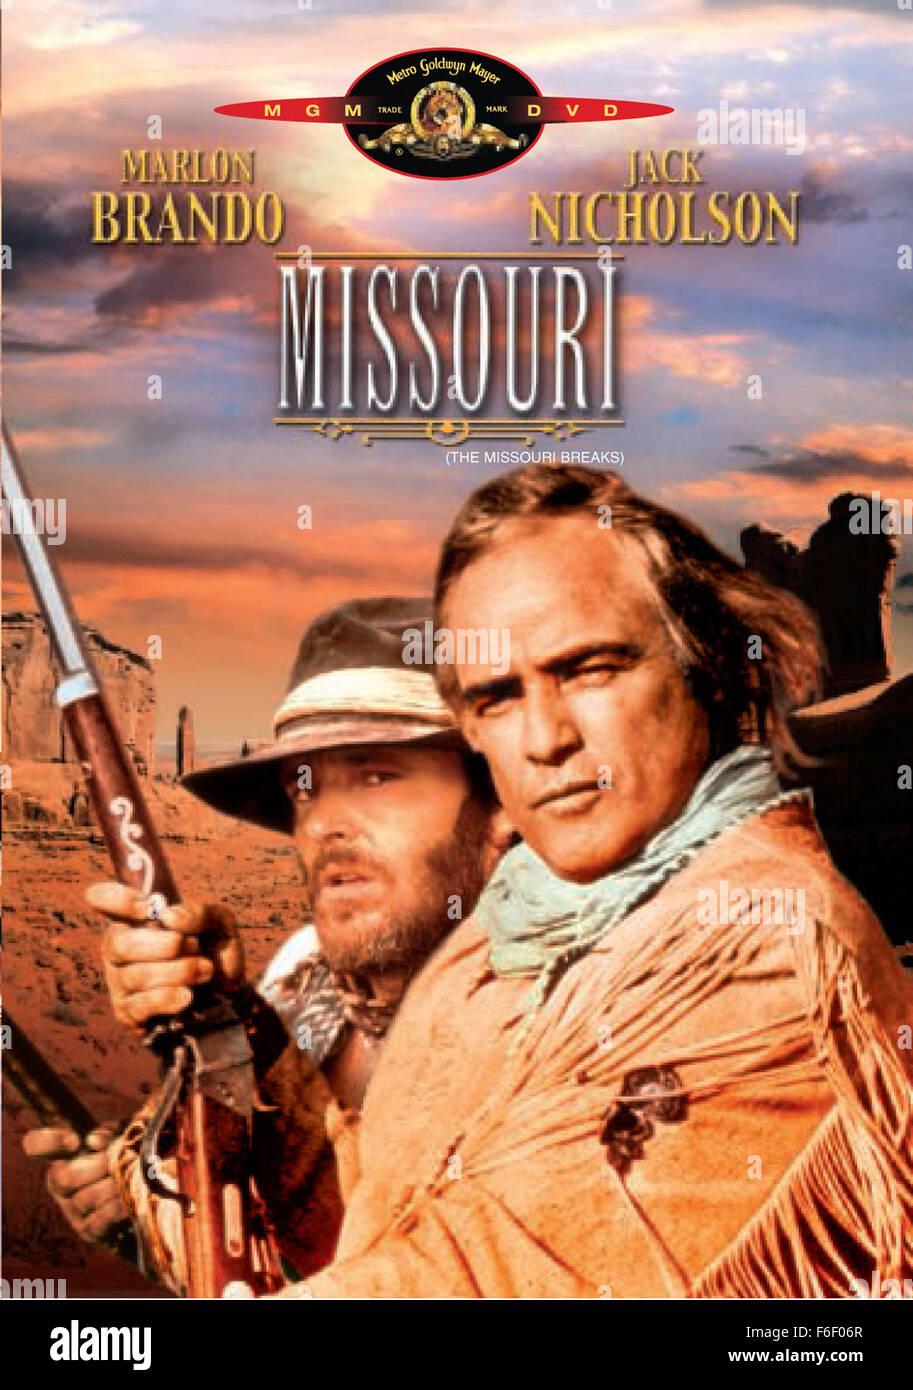 May 19, 1976; Los Angeles, CA, USA; Actor MARLON BRANDO stars as Robert E. Lee Clayton and JACK NICHOLSON as Tom - Stock Image